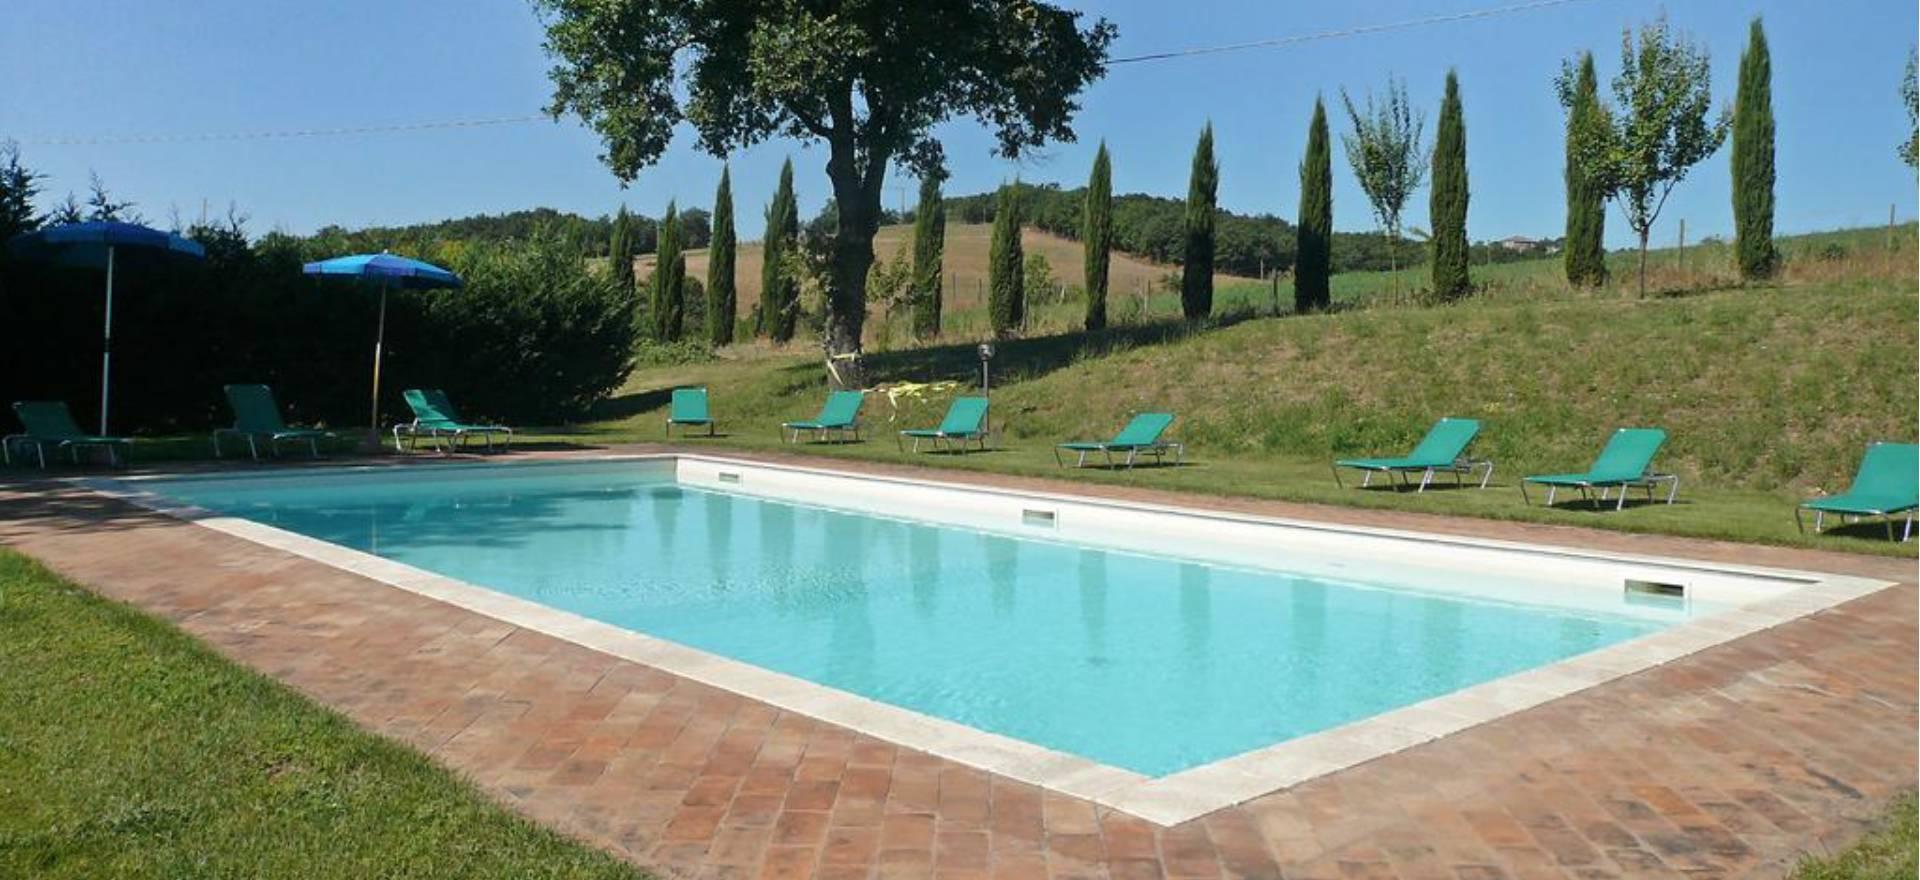 agriturismo toskana zwei h user mit privatem pool. Black Bedroom Furniture Sets. Home Design Ideas